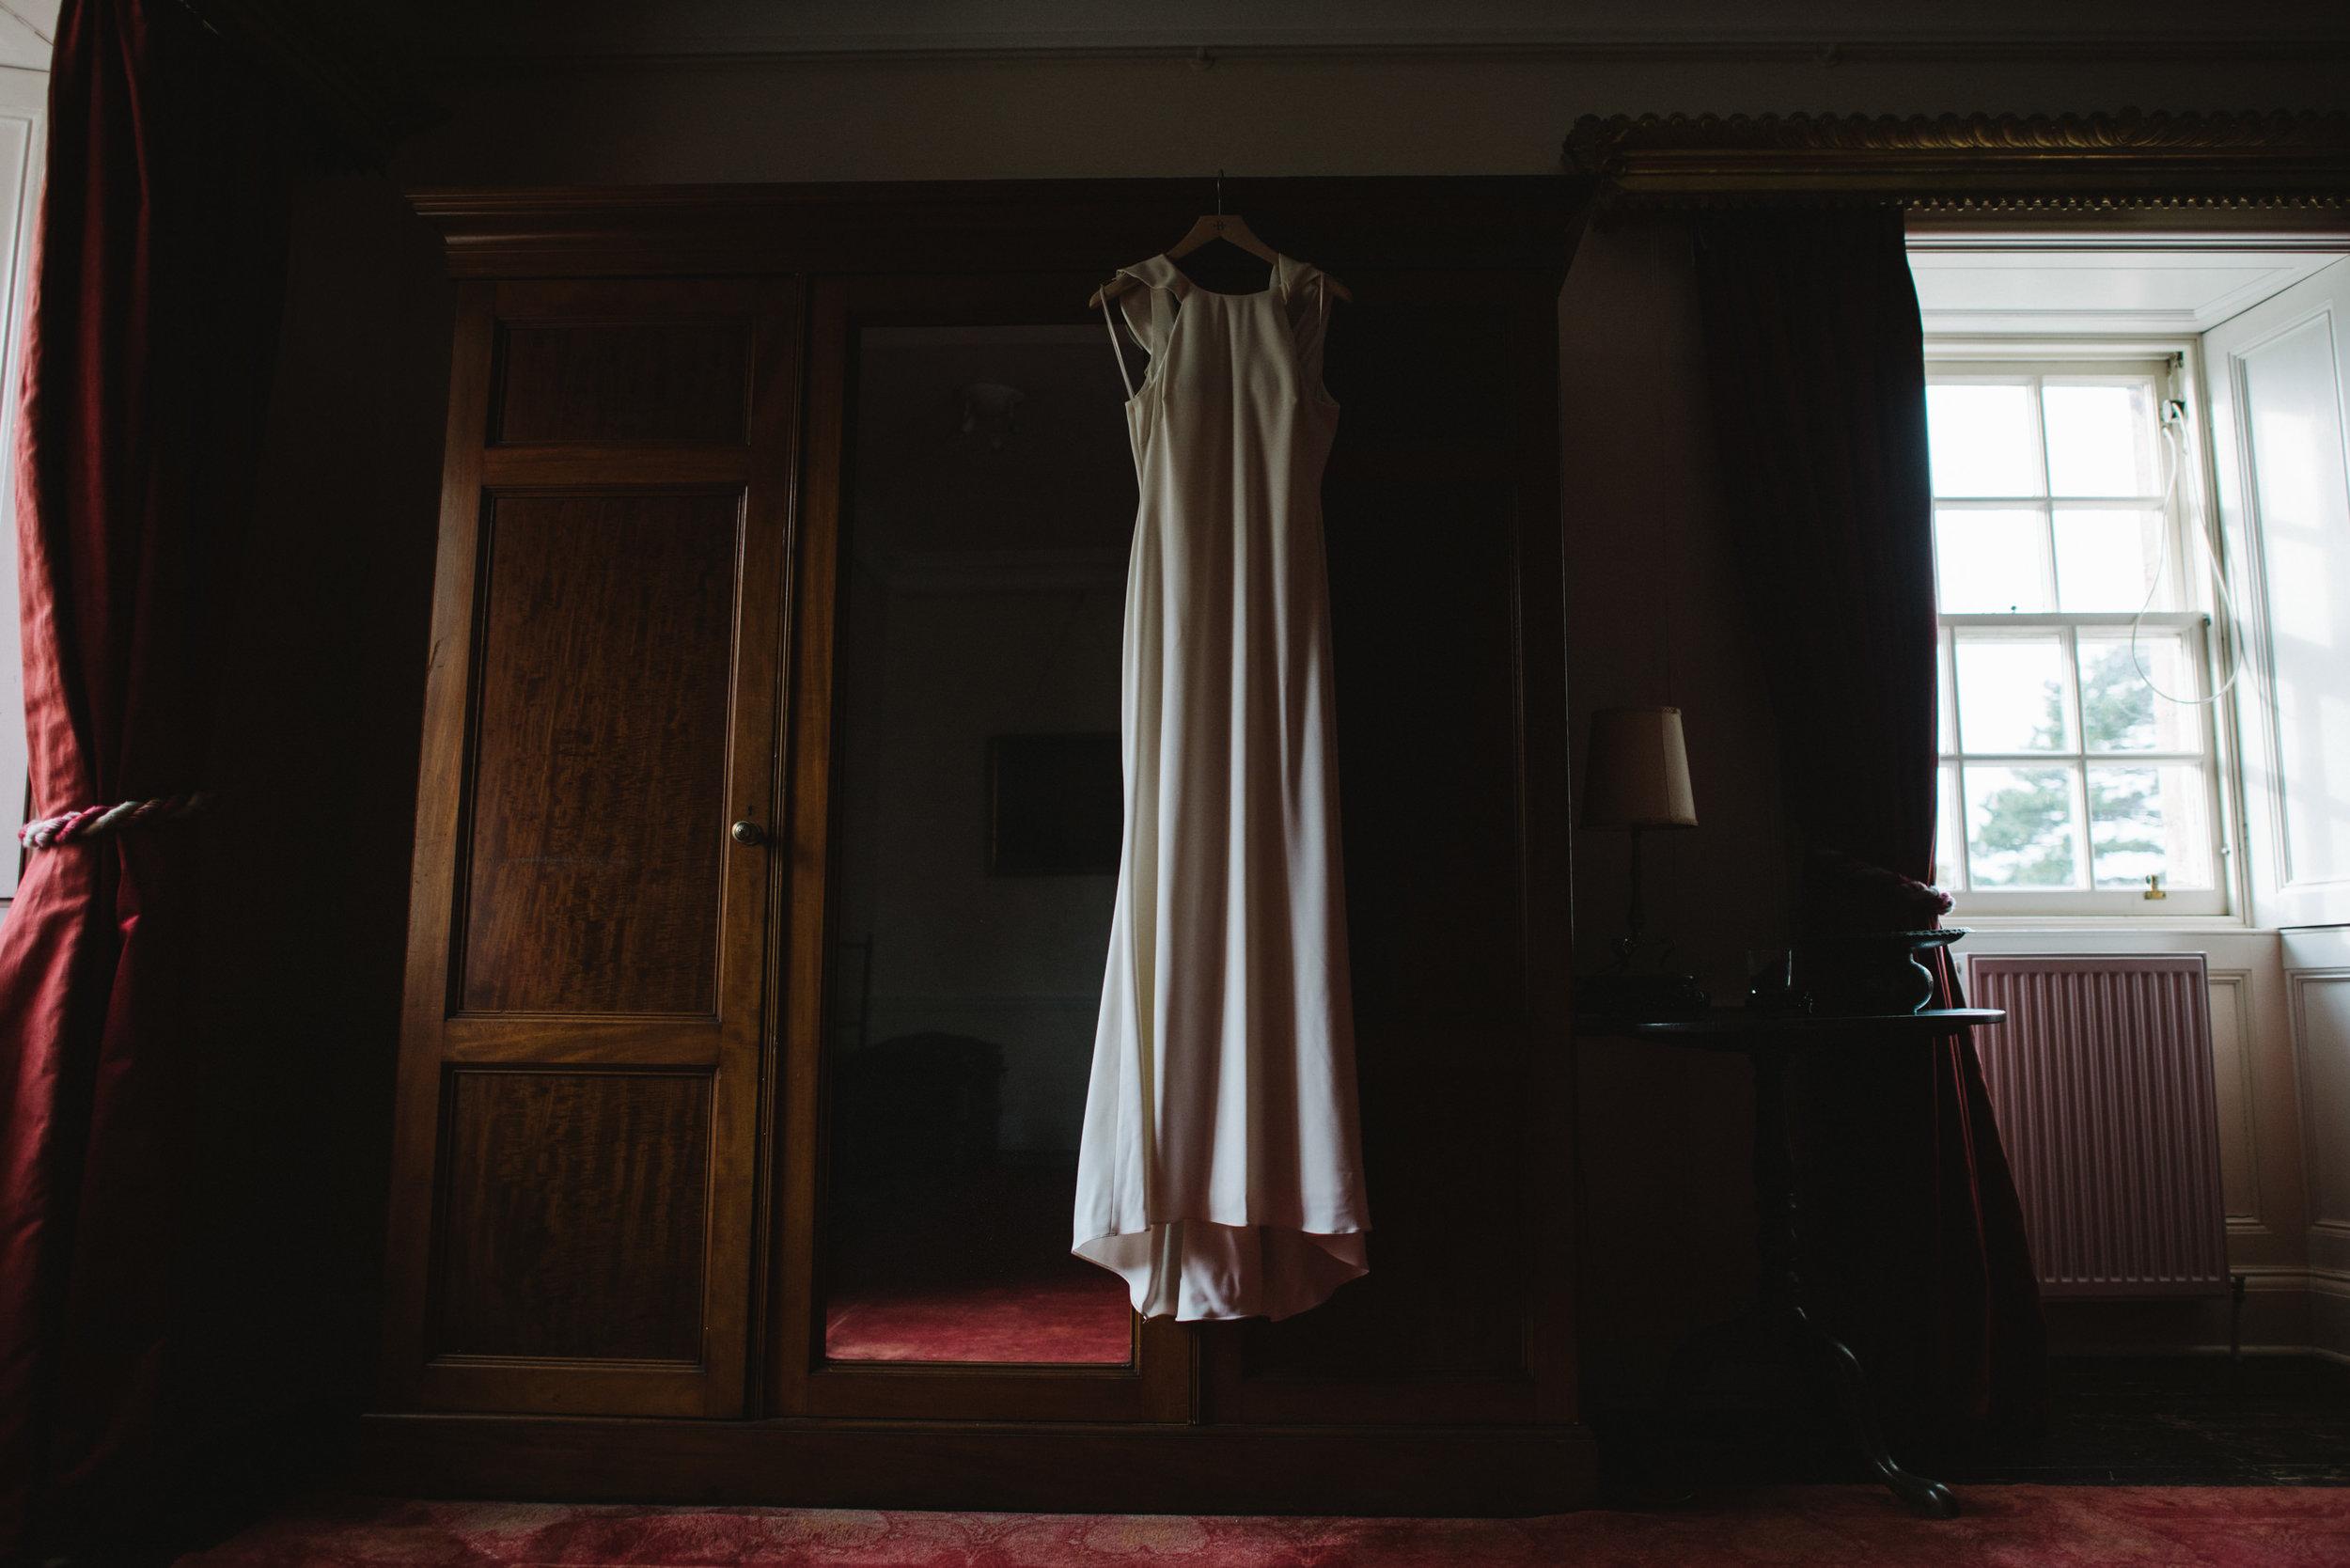 0038-LISA-DEVINE-PHOTOGRAPHY-ALTERNATIVE-WEDDING-PHOTOGRAPHY-SCOTLAND-DESTINATION-WEDDINGS-GLASGOW-WEDDINGS-COOL-WEDDINGS-STYLISH-WEDDINGS.JPG